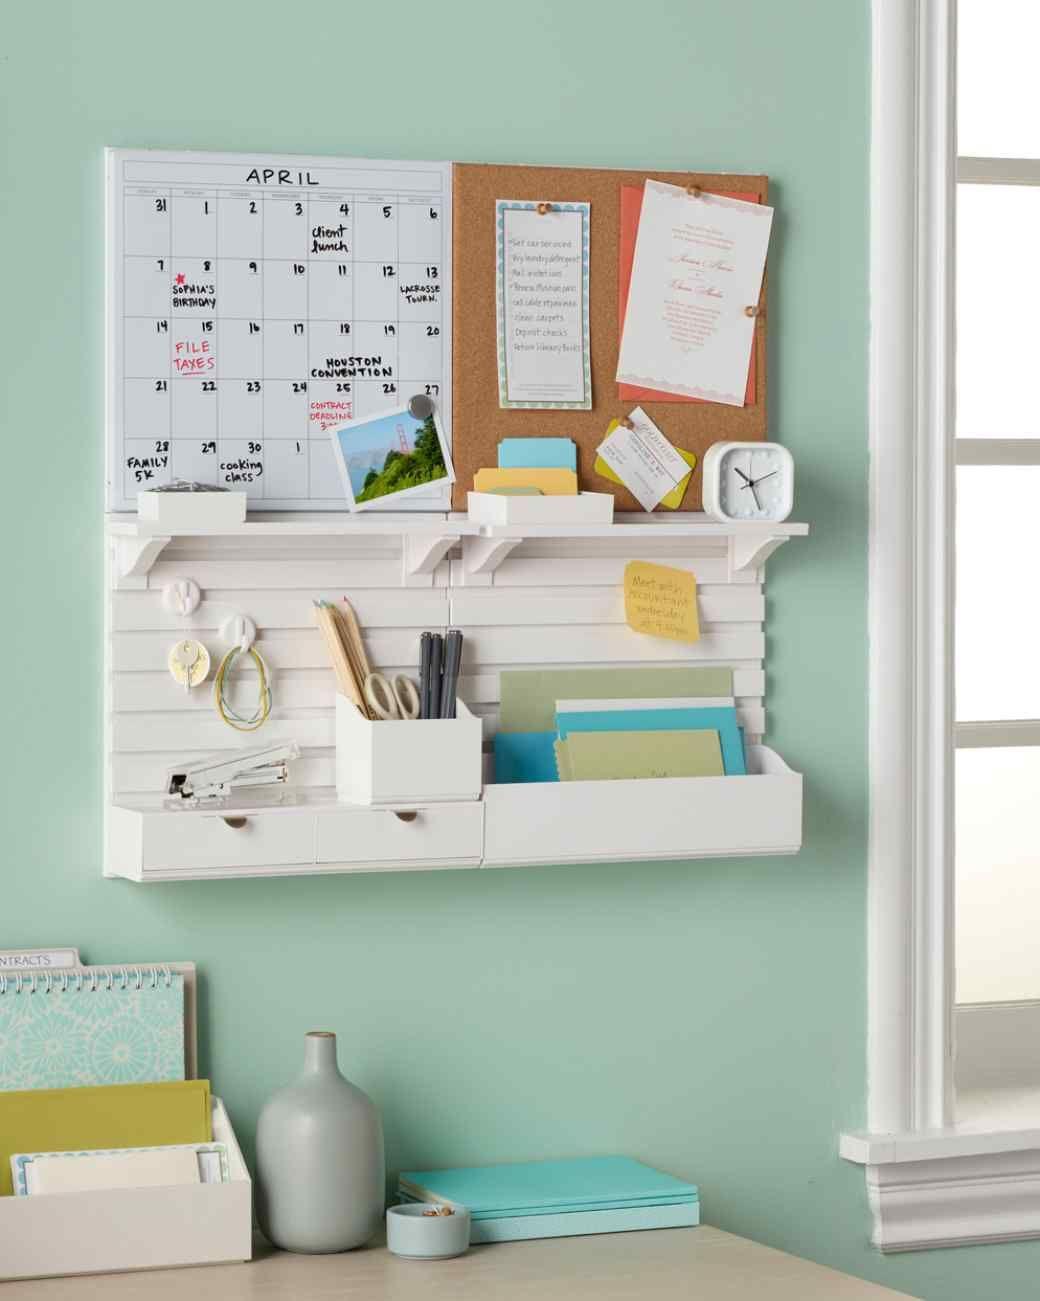 Las 12 mejores ideas para organizar tu escritorio - Organizadores hogar ...